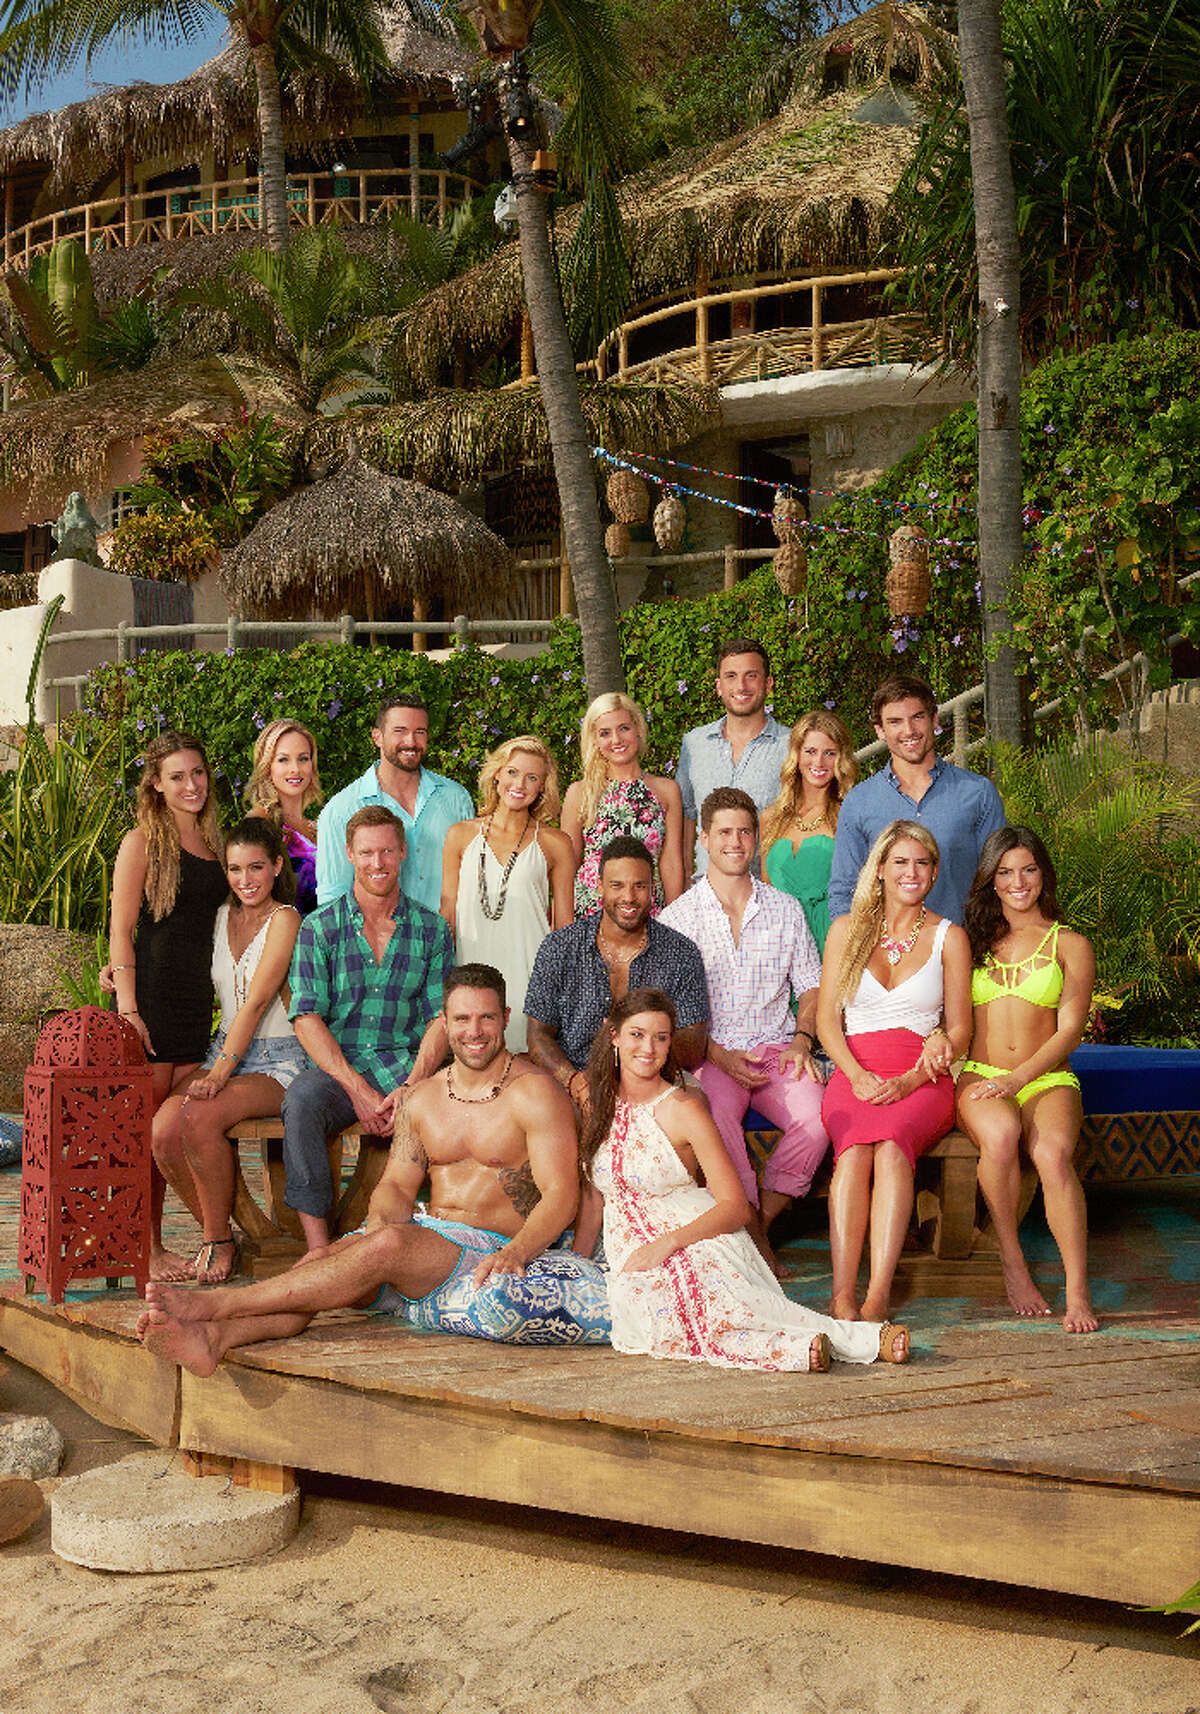 The Bachelor/Bachelor in Paradise States: Colorado, Massachusetts, Michigan, Minnesota, MassachusettsSource: CableTV.com